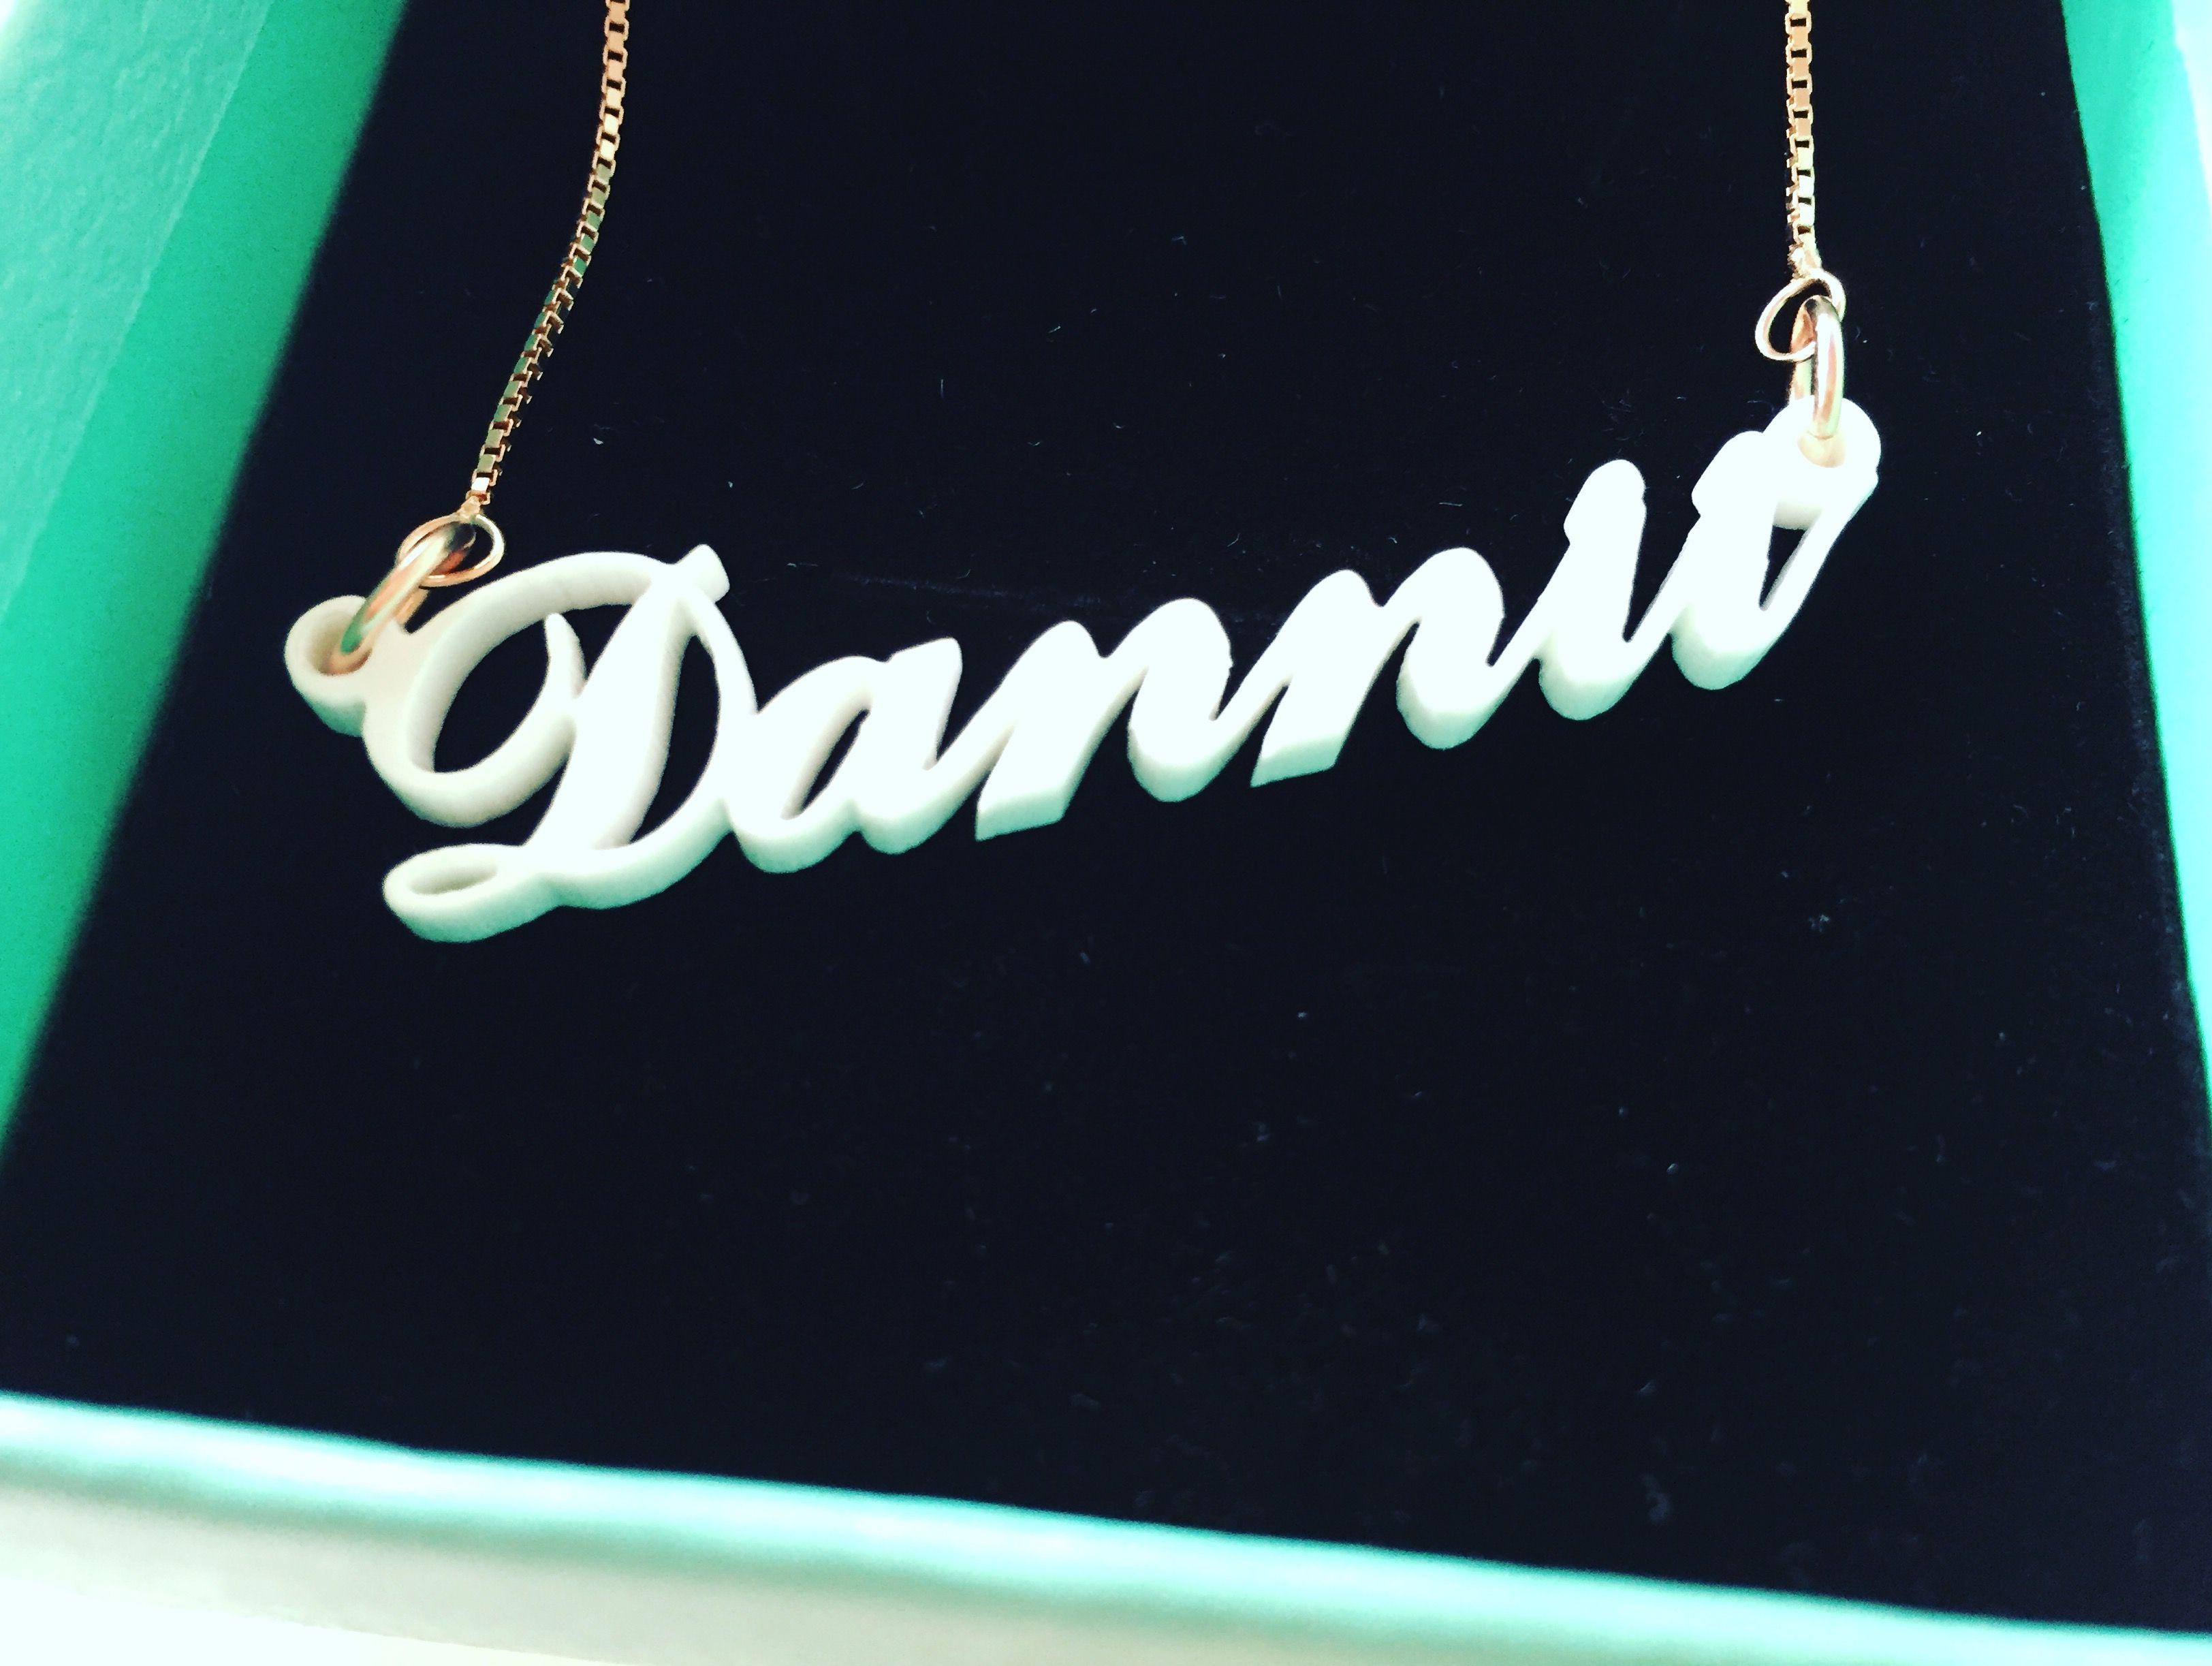 Acrylic name necklaces